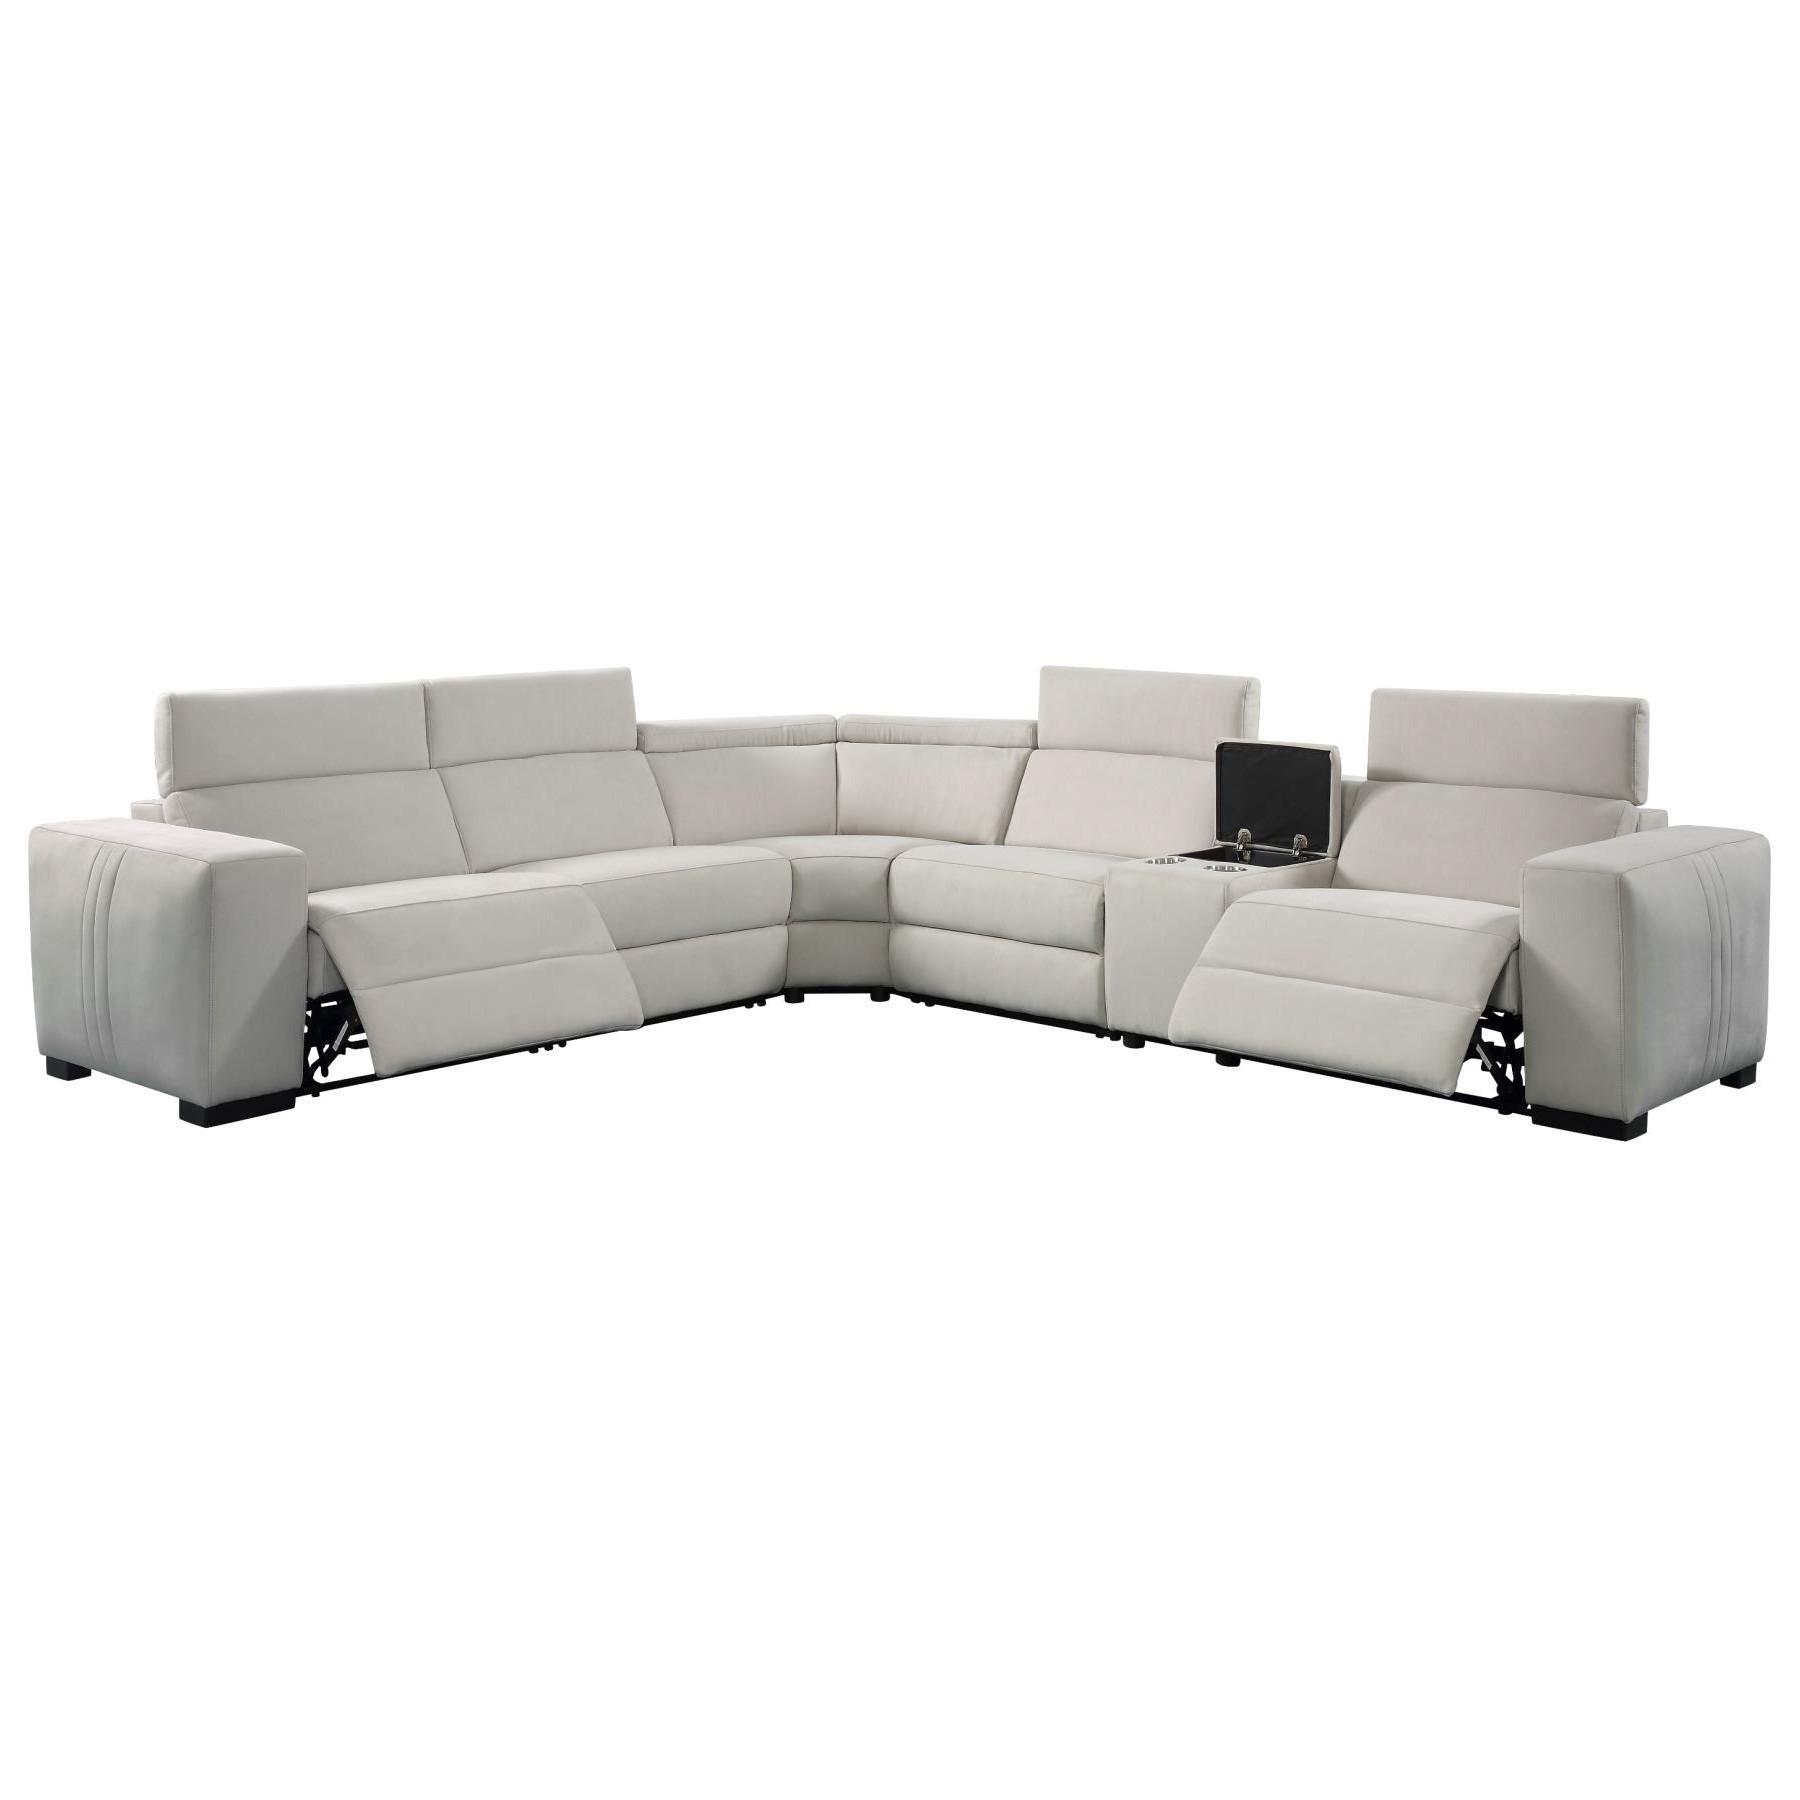 Genie Fabric Modular Corner Sofa, Light Grey